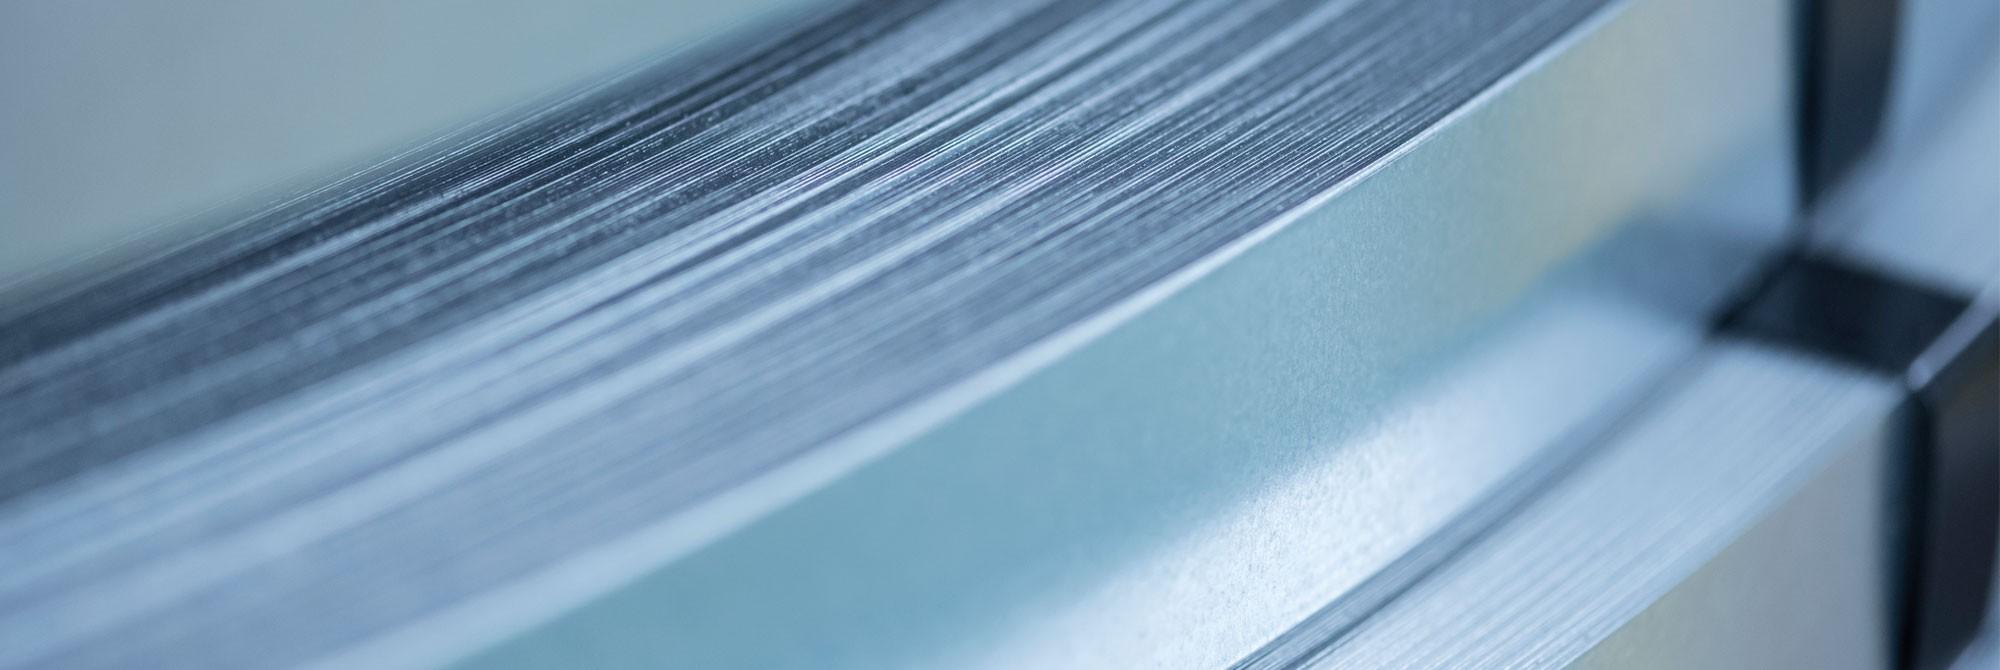 Hot-dip coated sheet